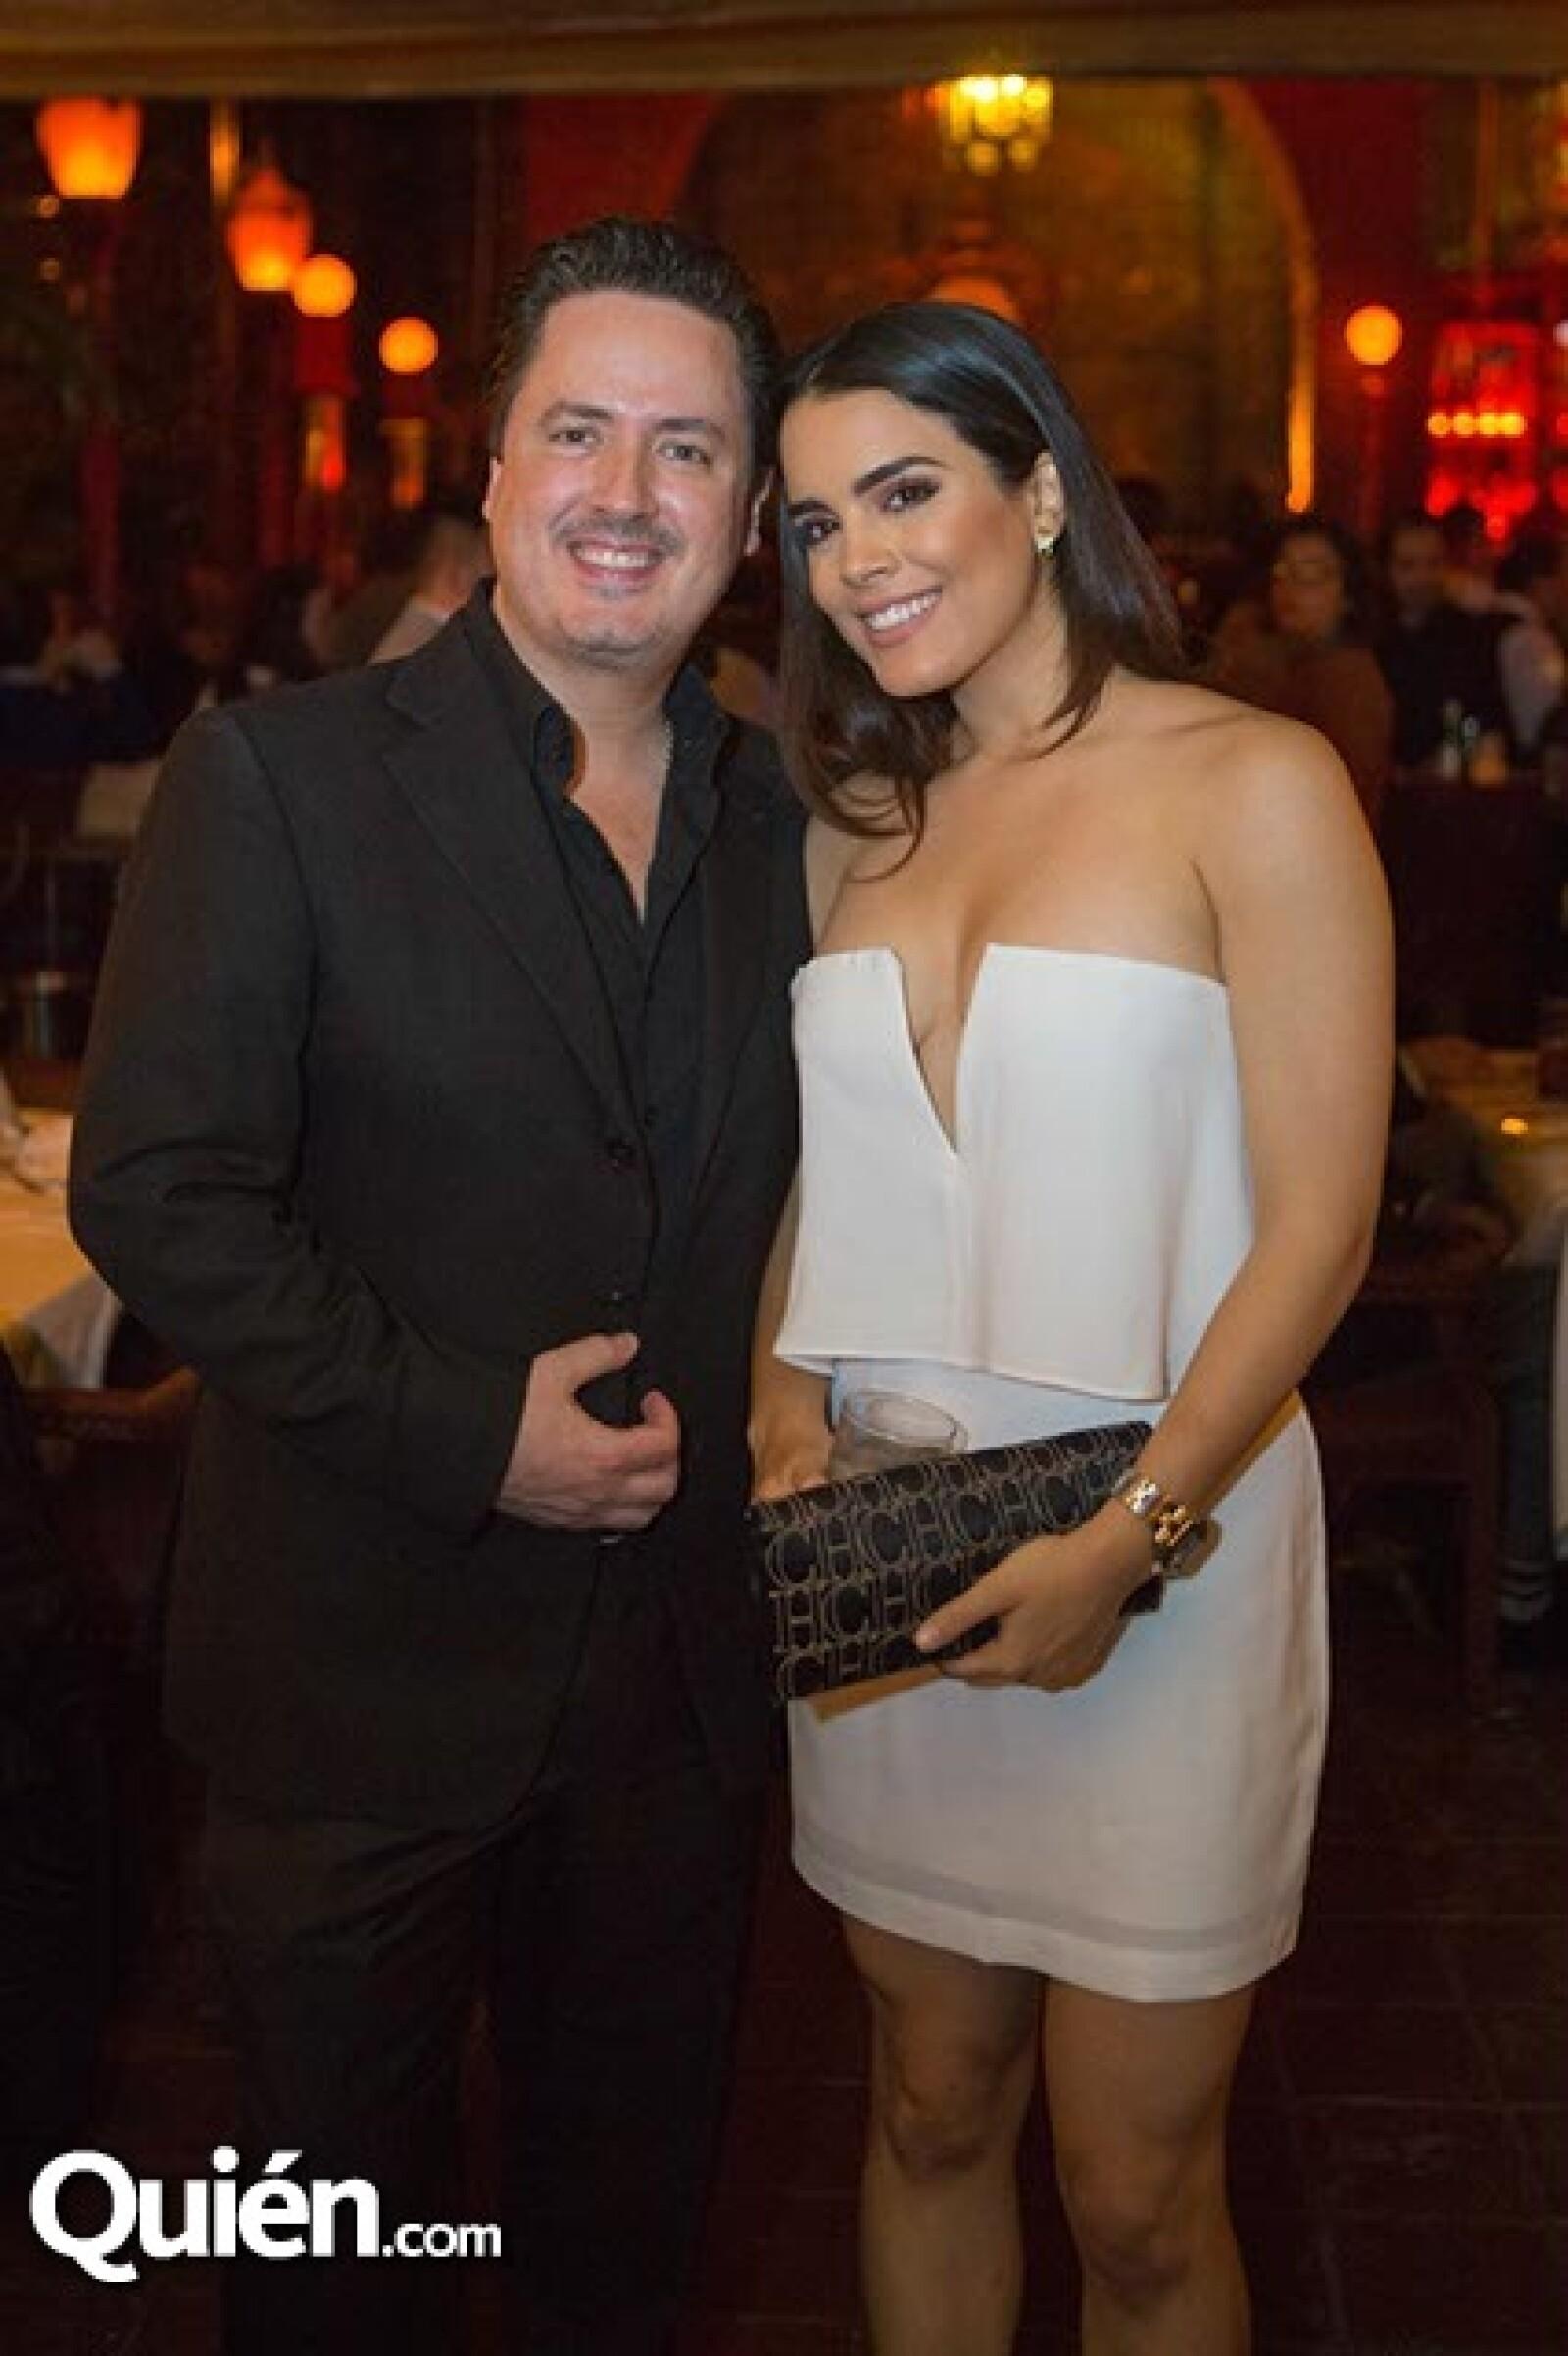 Ricardo Barroso y Gabriela Pablos